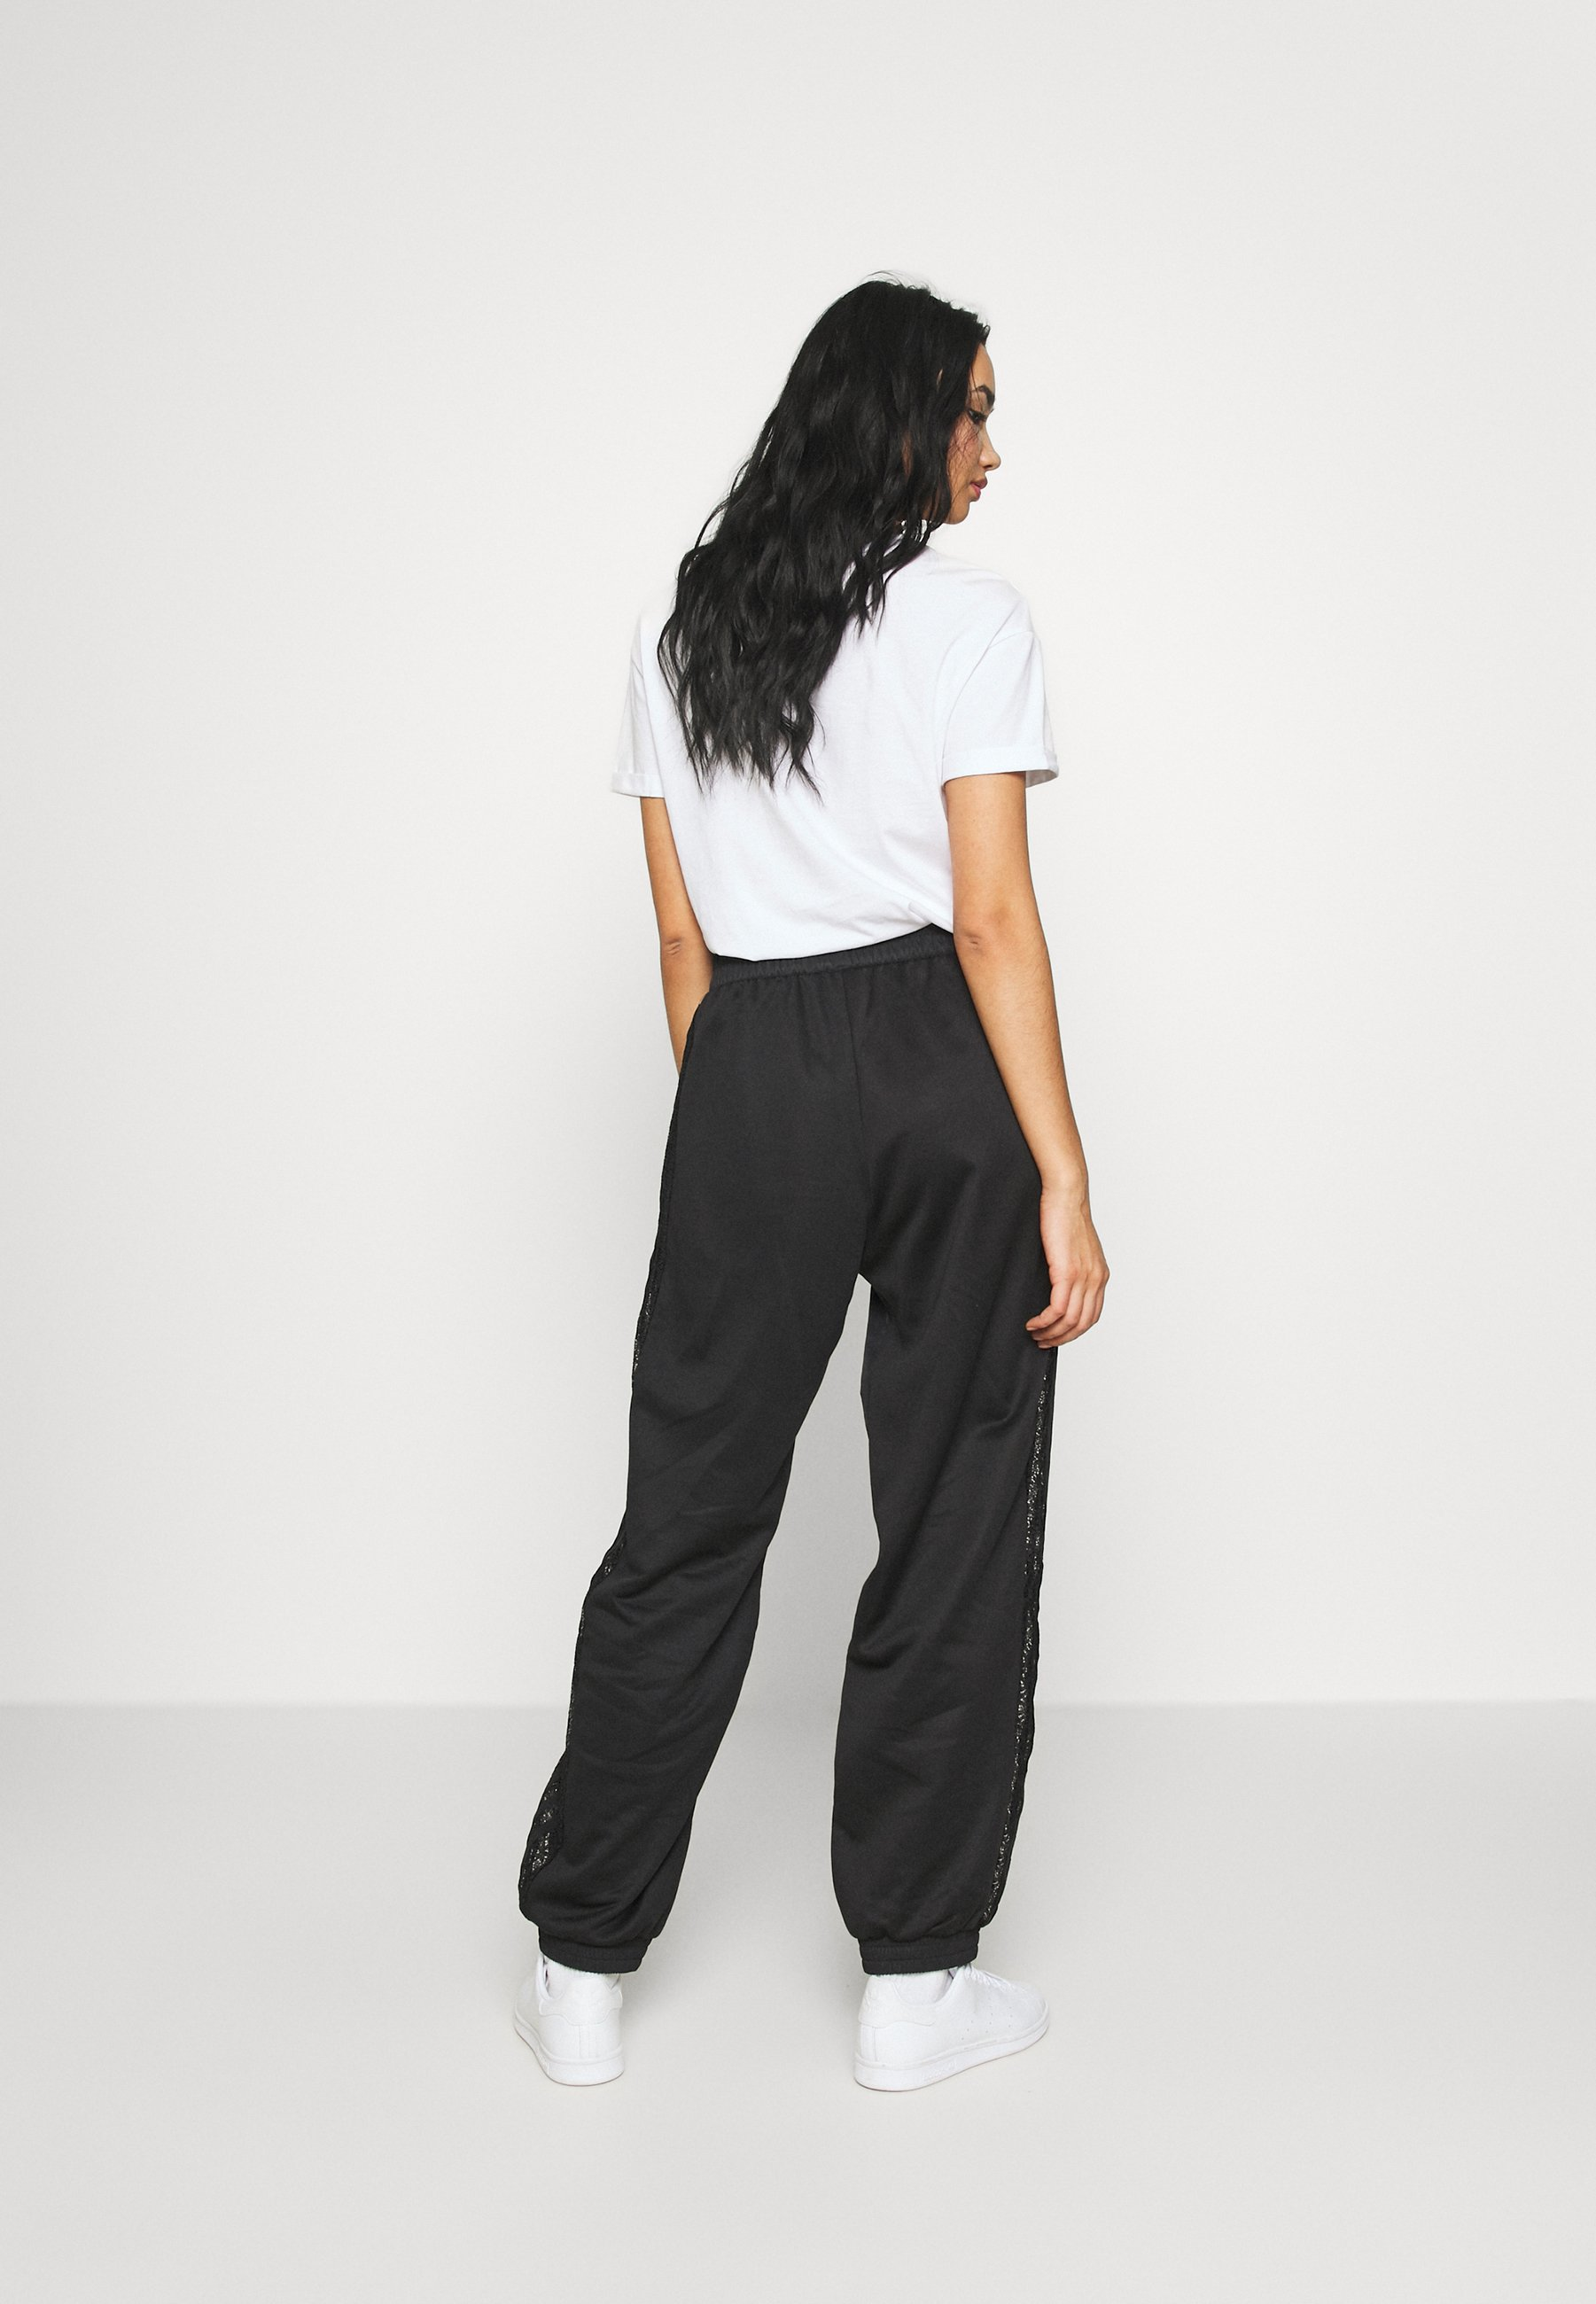 adidas Originals BELLISTA NYLON CUFFED SPORT PANTS - Pantalon de survêtement - black - Pantalons & Leggings Femme W9UUV